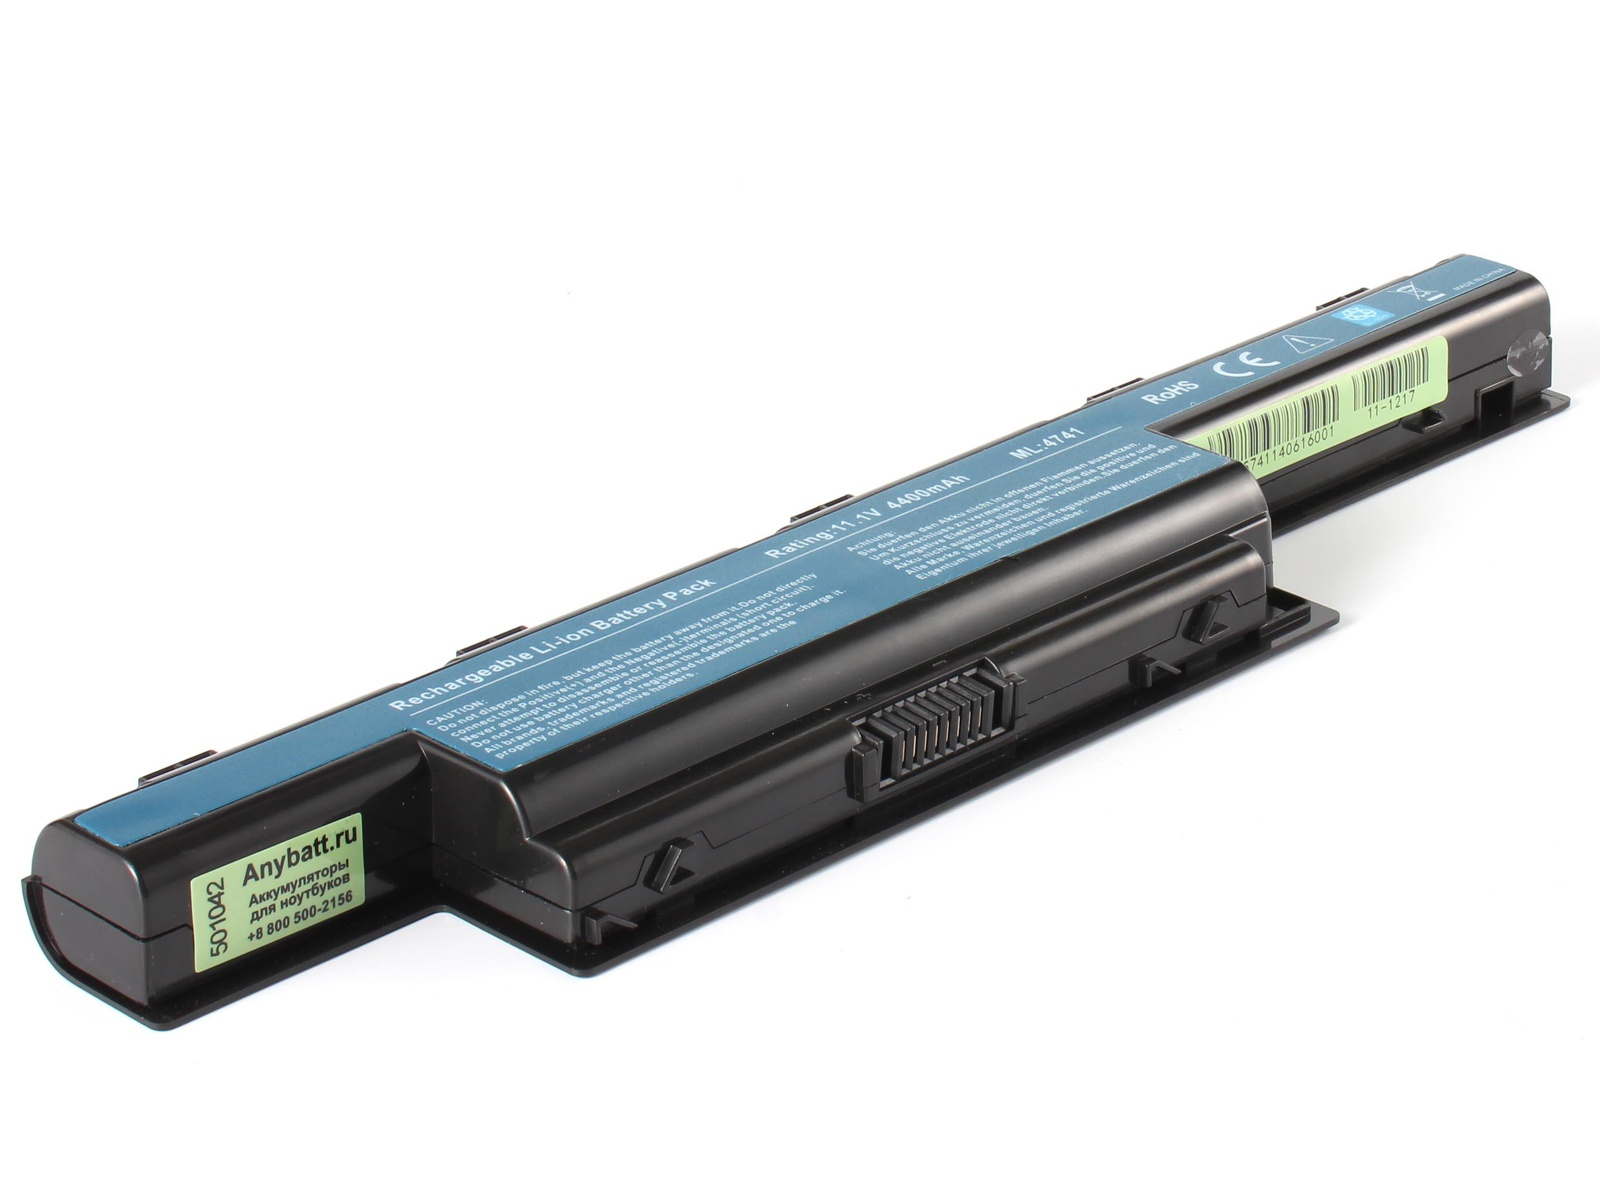 Аккумулятор для ноутбука AnyBatt для Acer eMachines E644-E302G32Mnkk, eMachines E730G-332G32Miks, eMachines E732G-382G32Mnkk, eMachines E732Z-P612G25Mikk, eMachines G730G-383G50Miks, Travelmate P453 M-33124G32Makk монитор emachines e220hqv